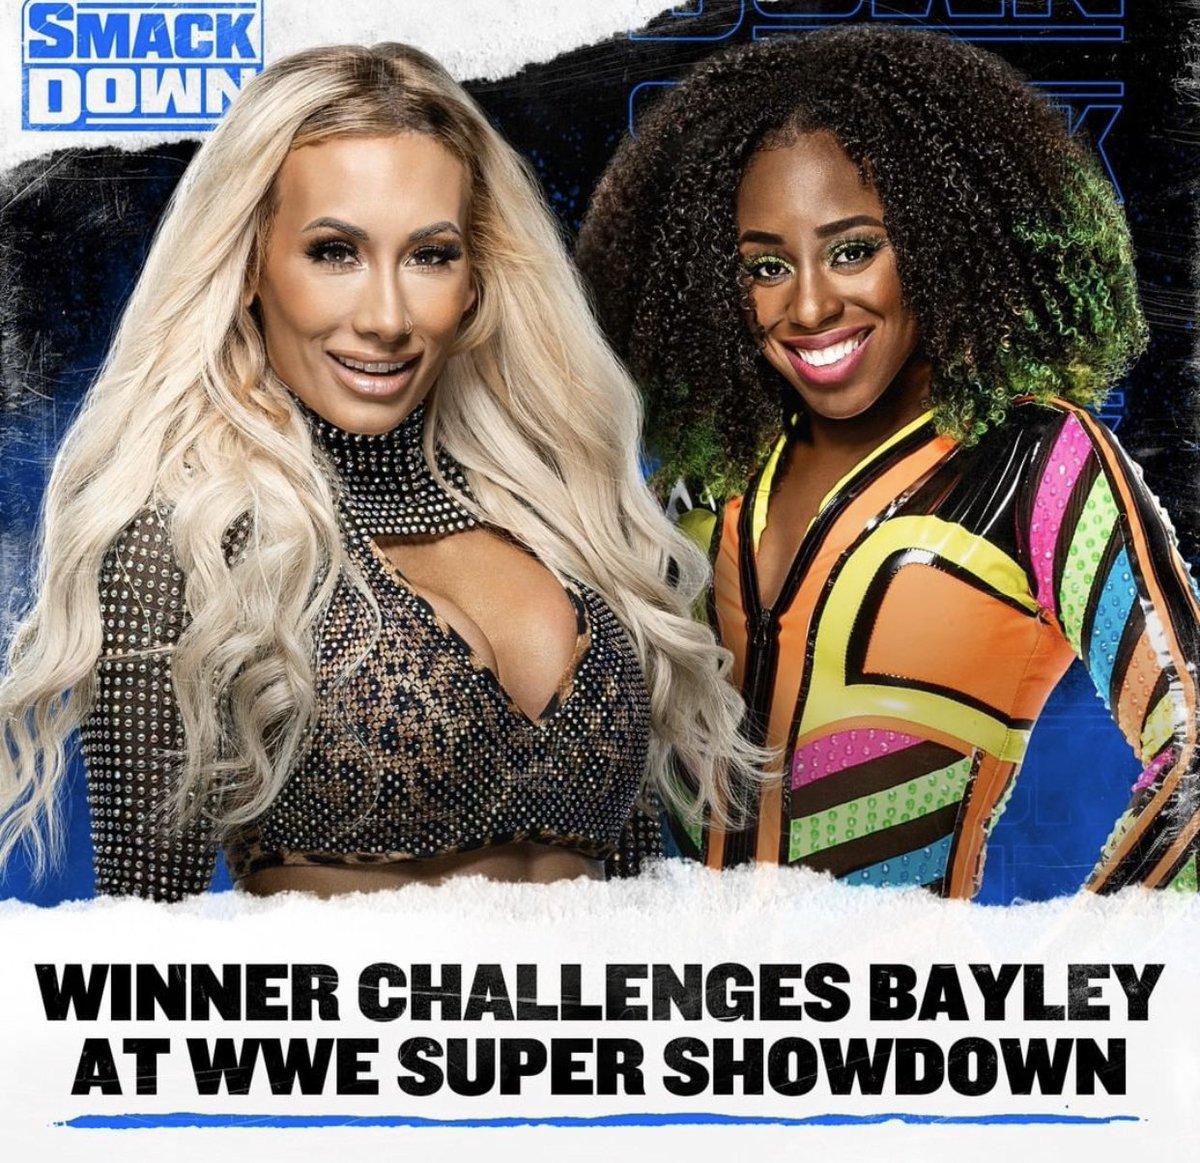 Bayley will make the winner look like a clown at #Showdown  #SmackDownOnFox <br>http://pic.twitter.com/rMNXDrJK1r